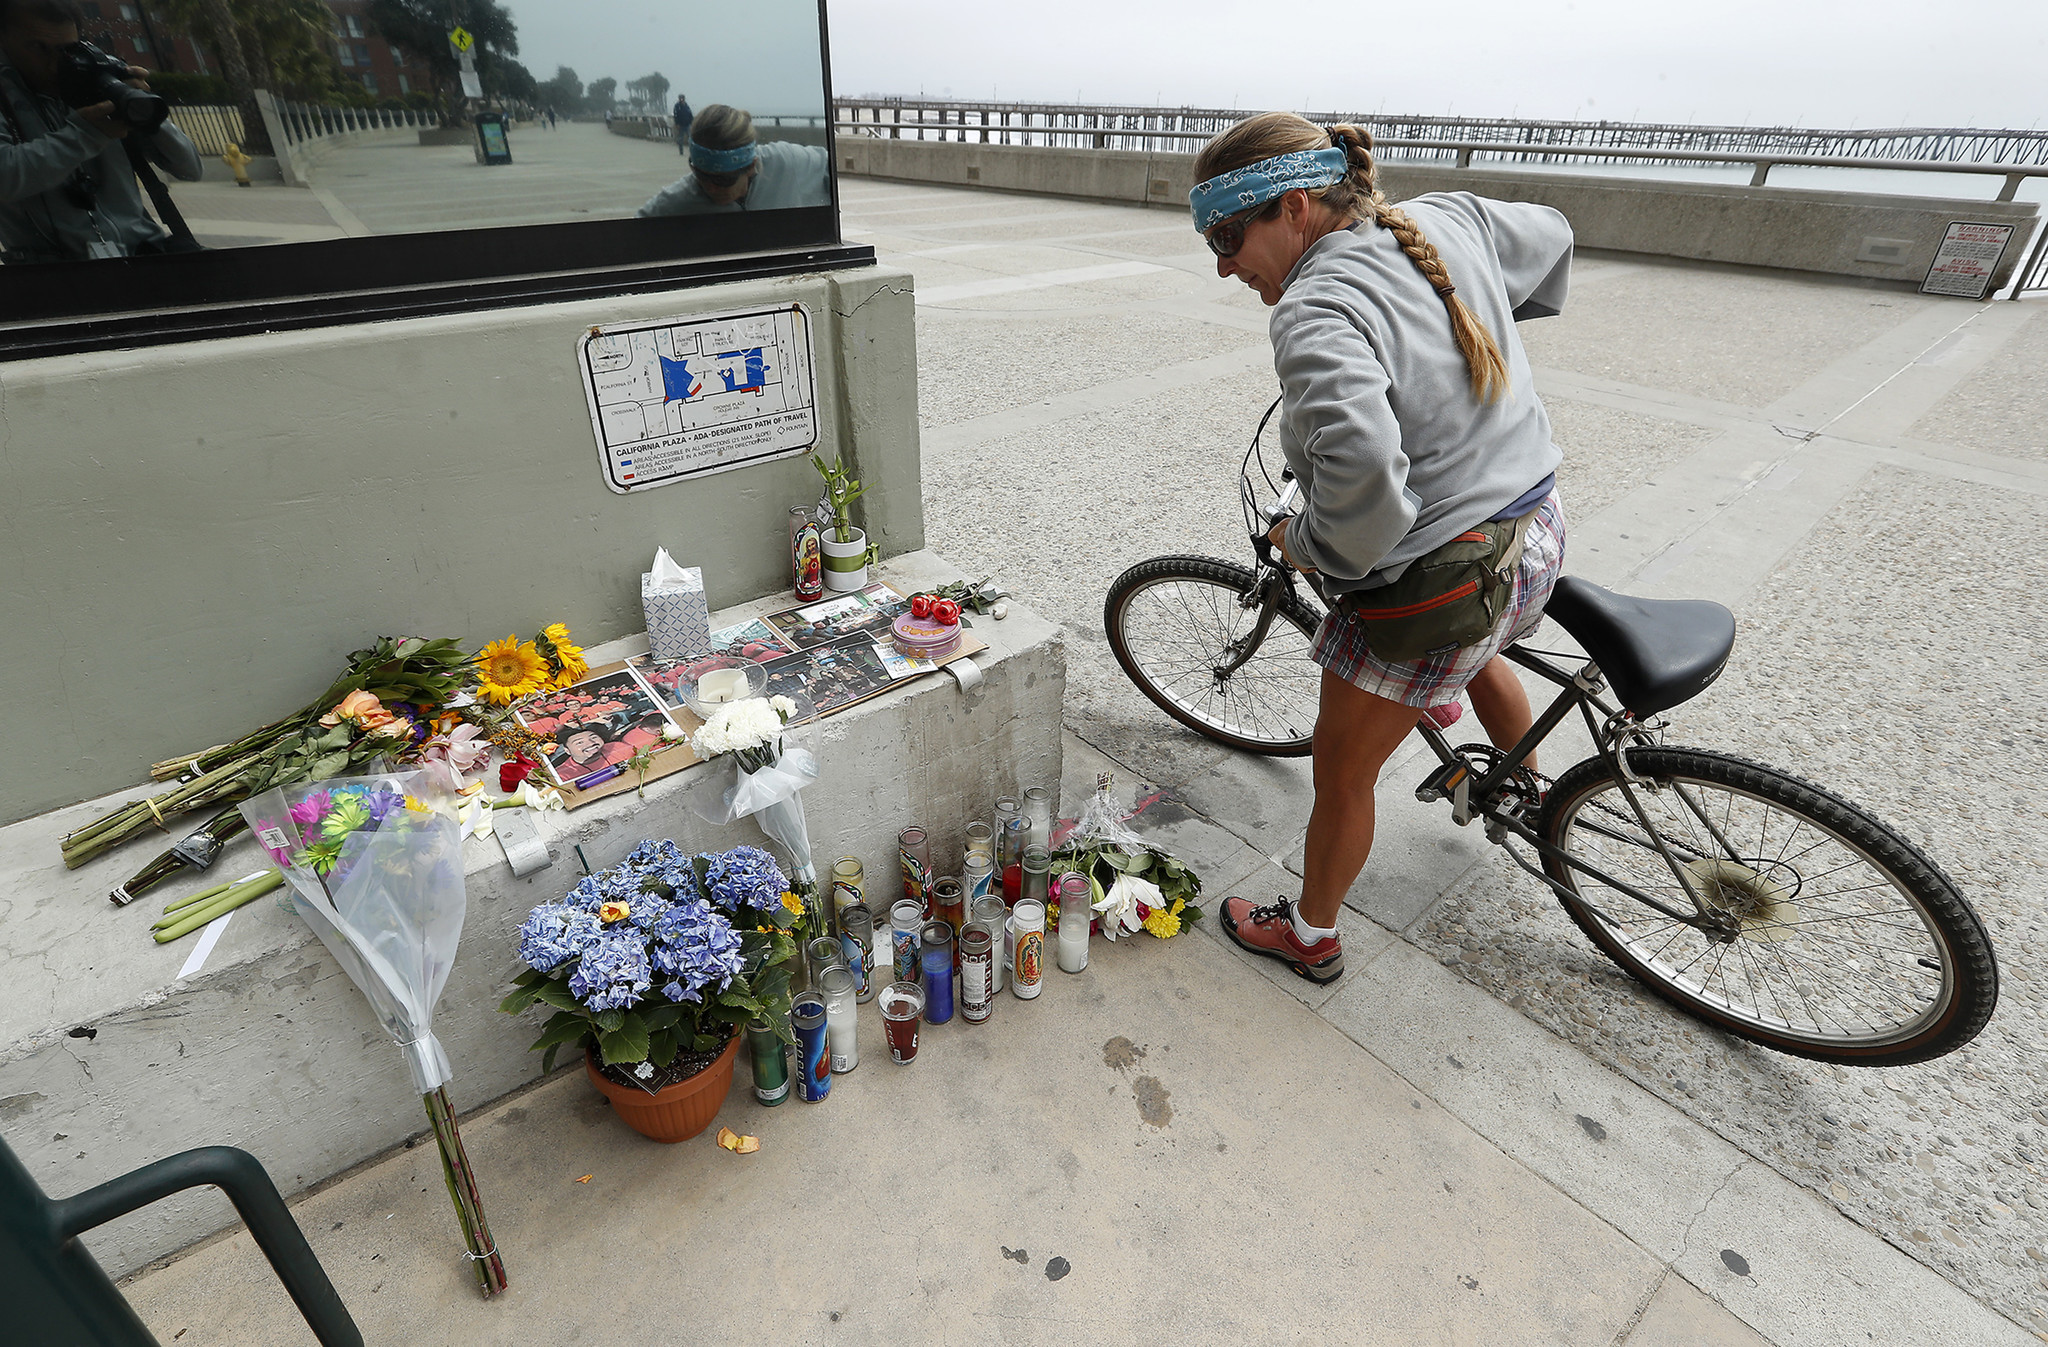 VENTURA, CA-APRIL 23, 2018: Alicia Carman of Ventura looks at a memorial outside of Aloha Steakhous